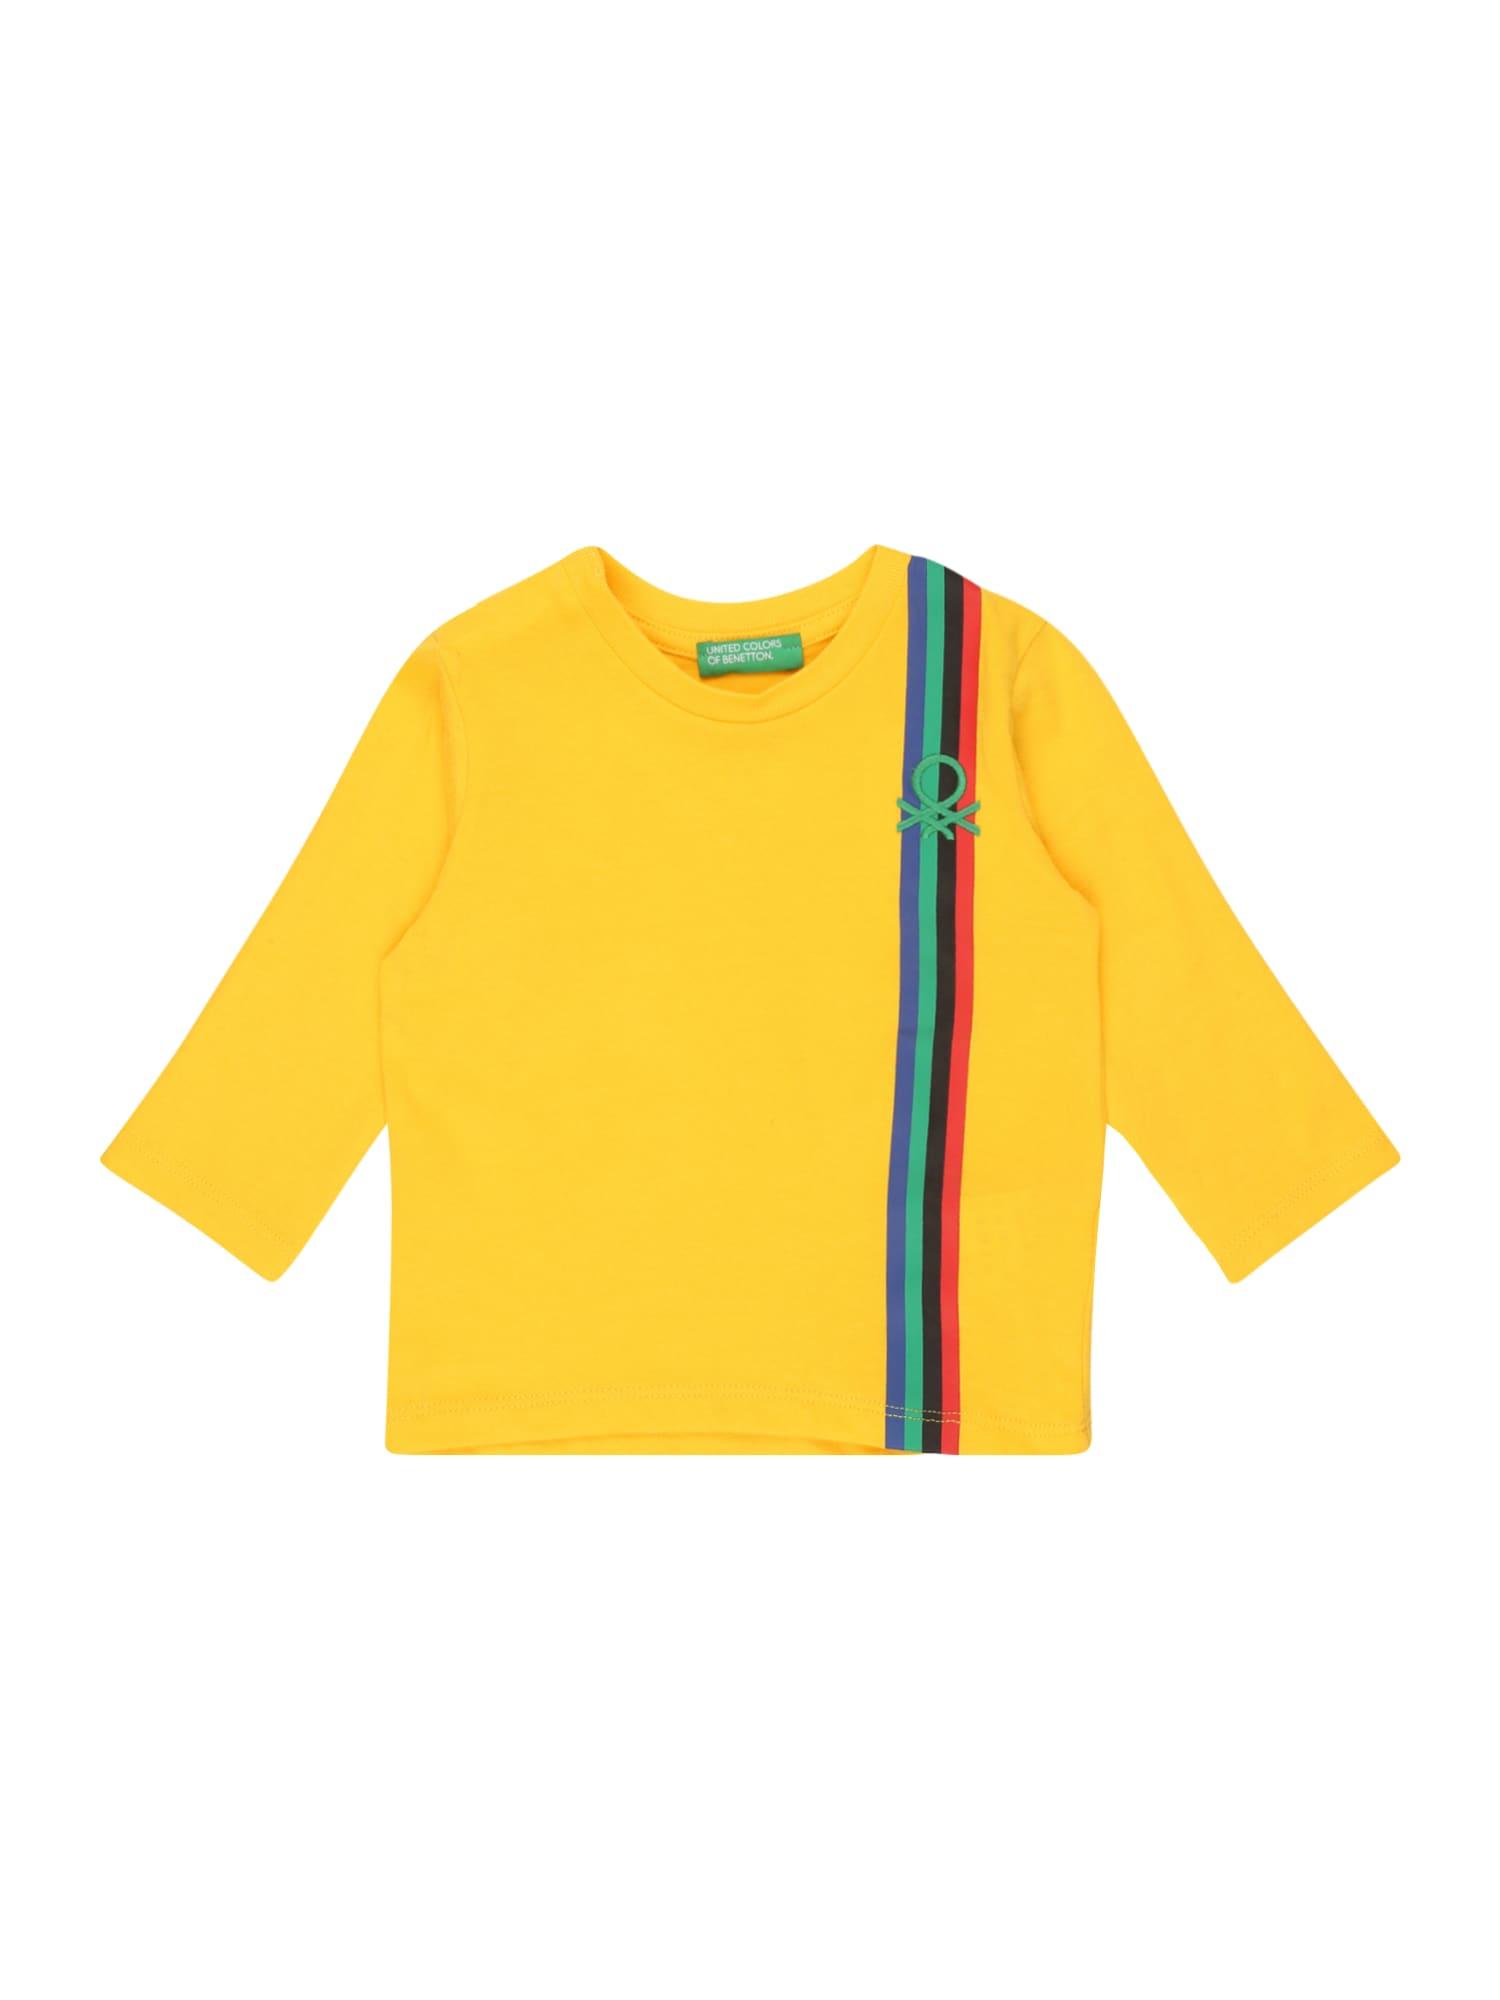 UNITED COLORS OF BENETTON Tričko  žlutá / mix barev